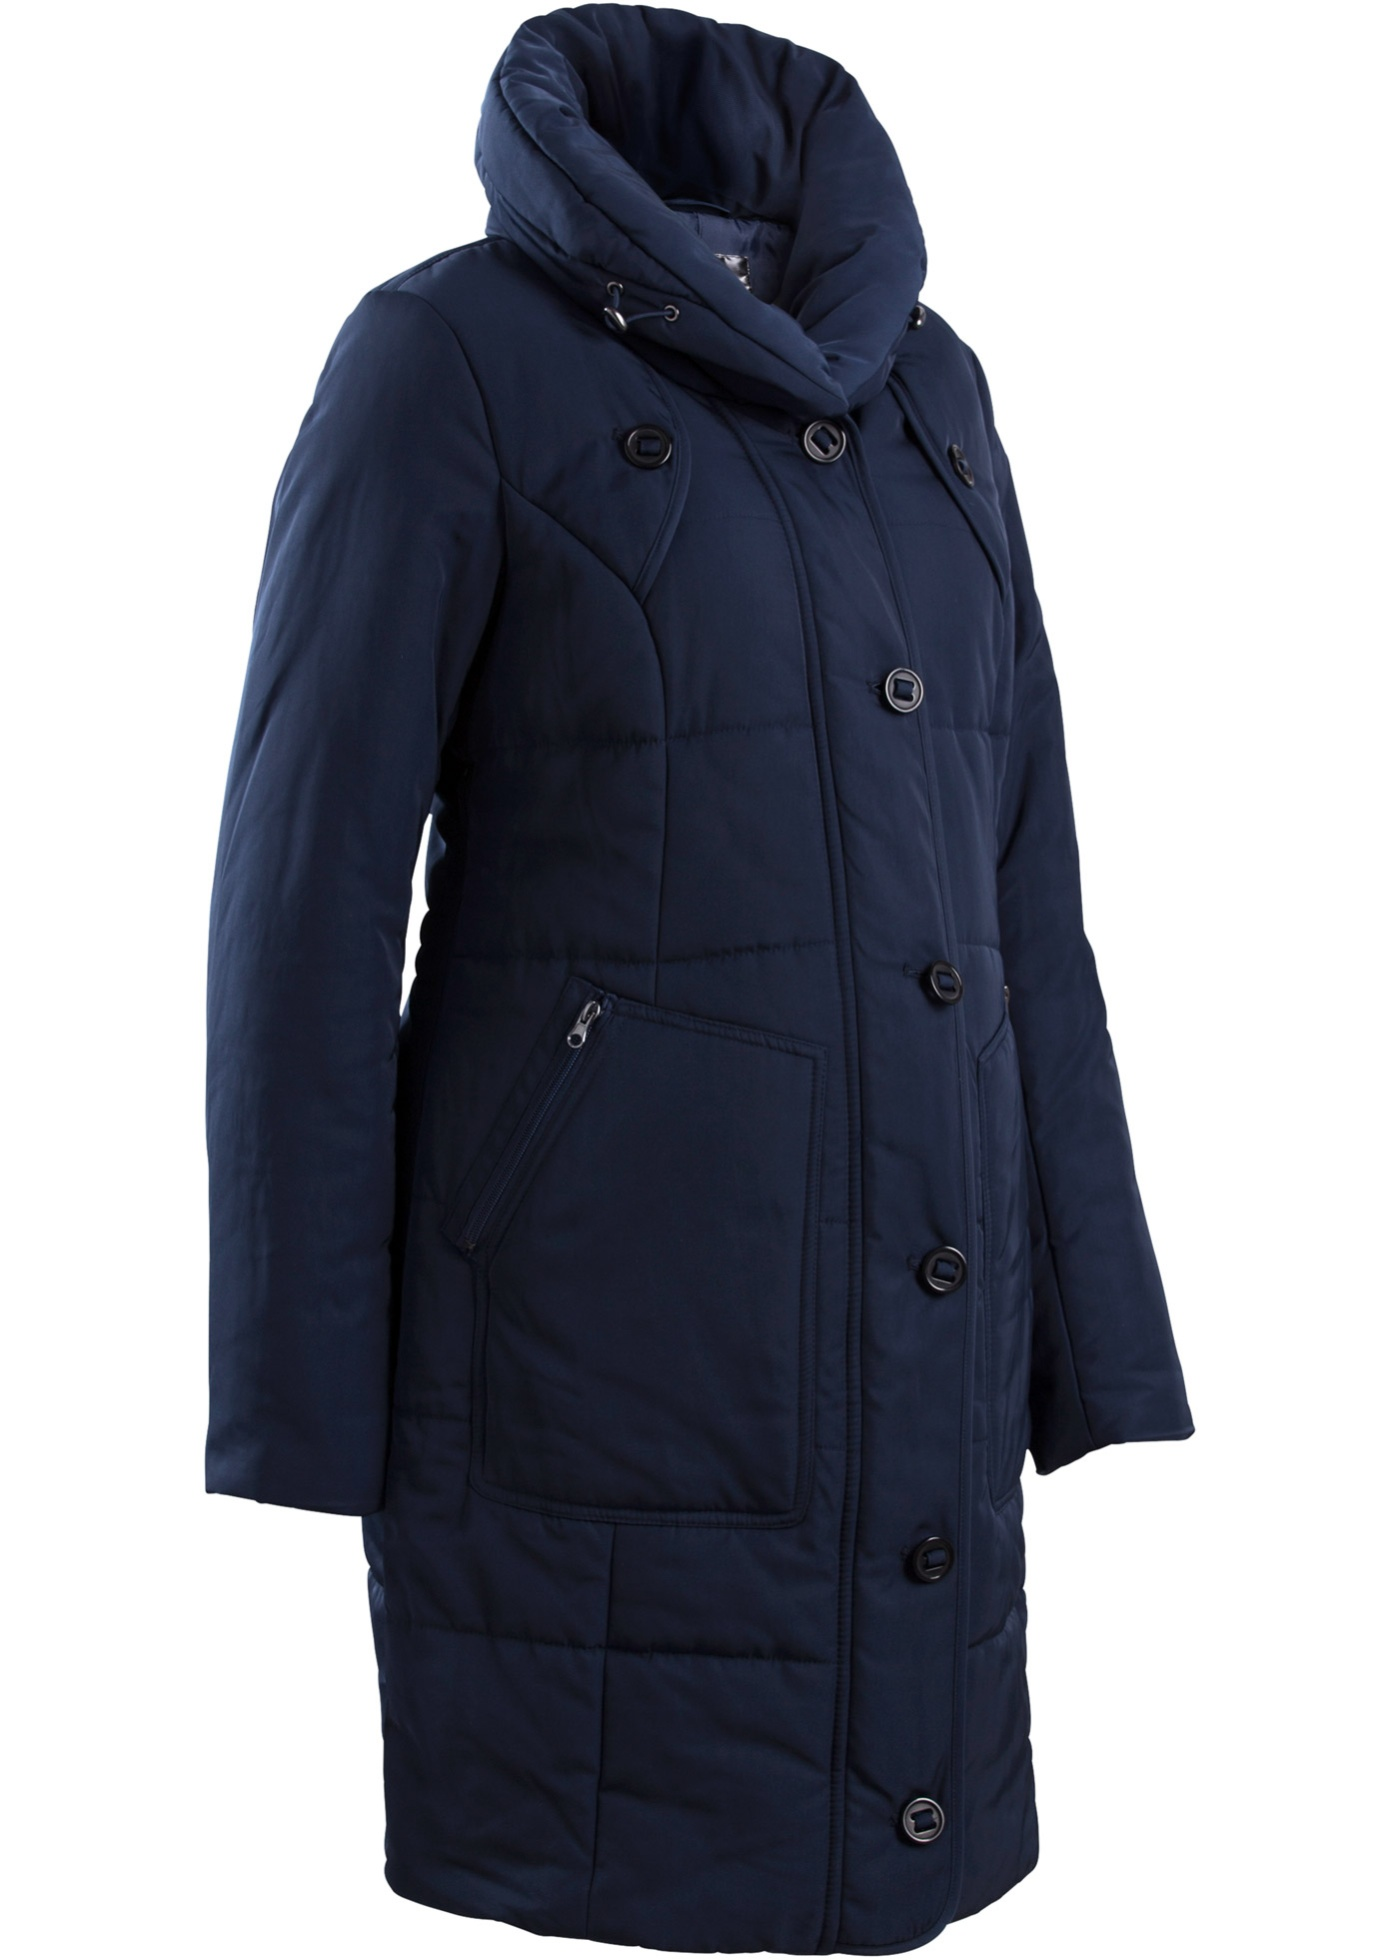 Manteau matelassé de grossesse, ajustable